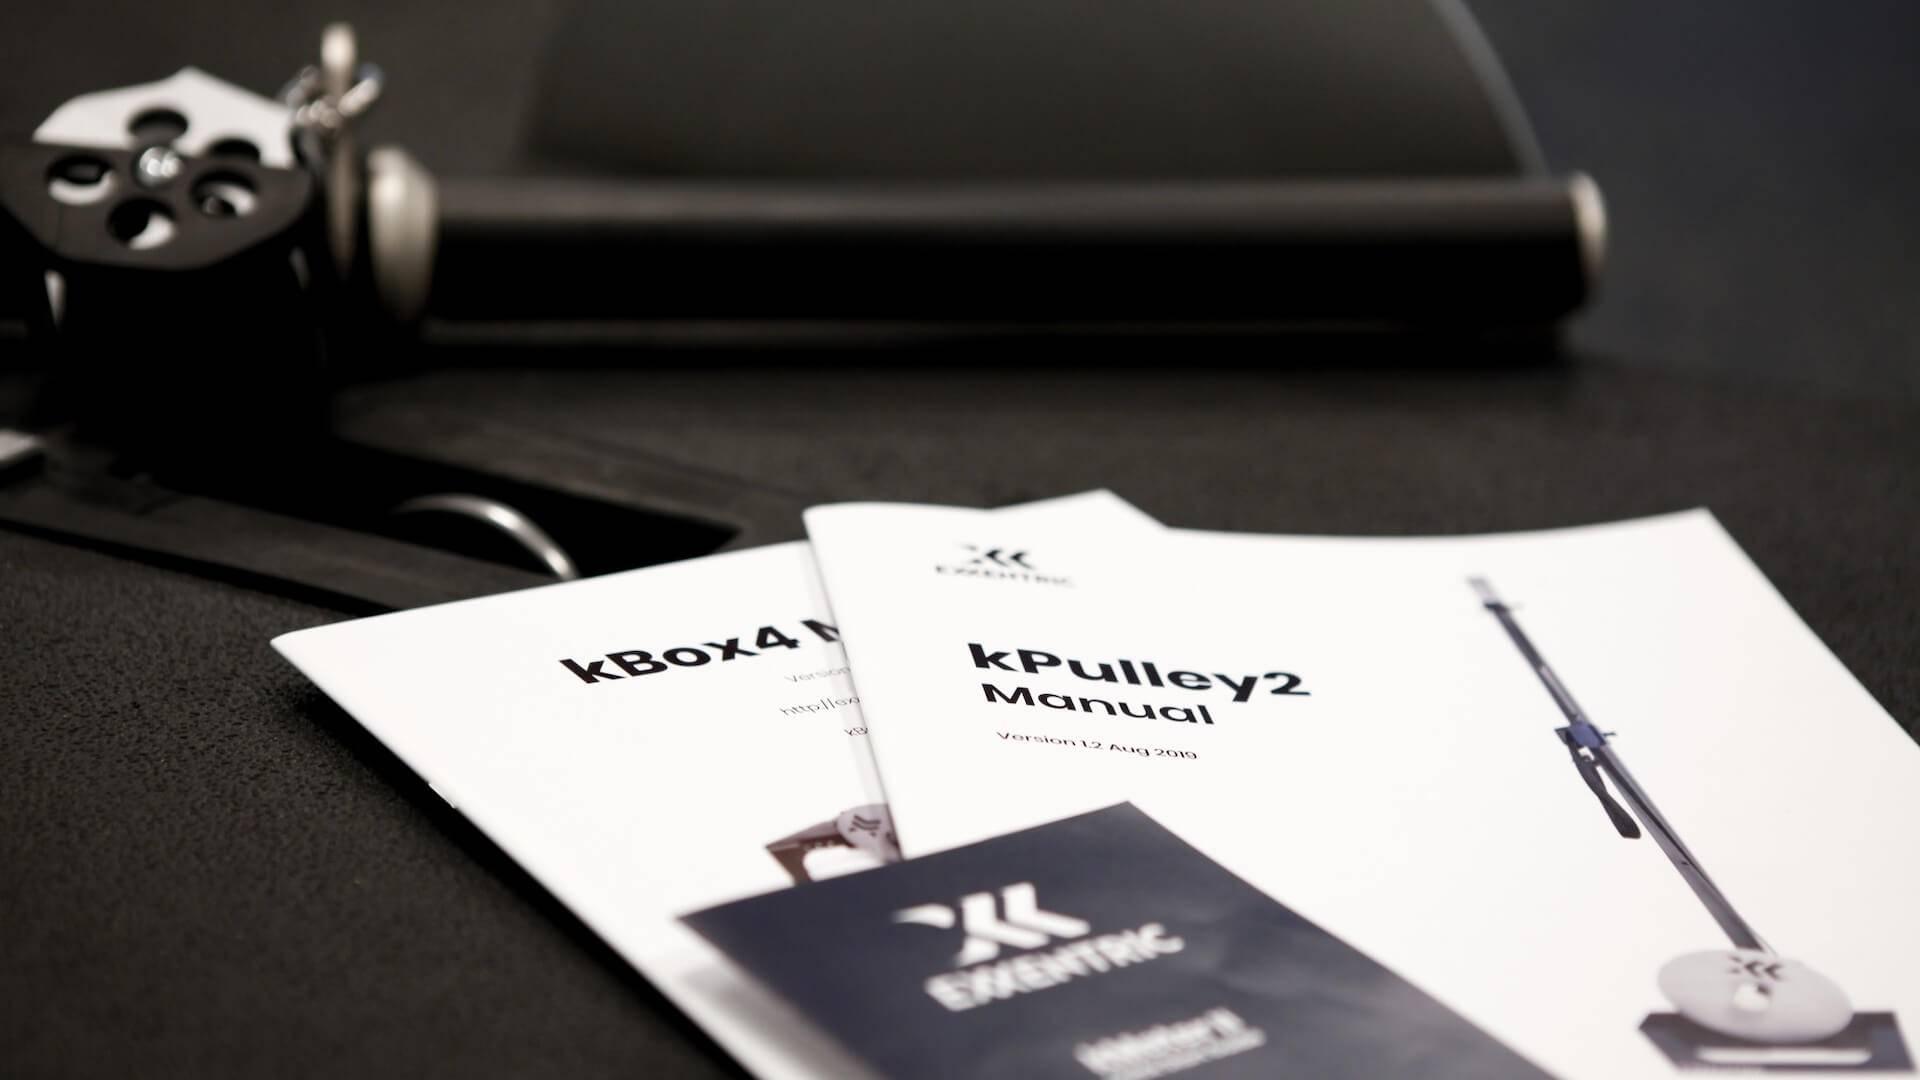 Manuals kBox4 kPulley2